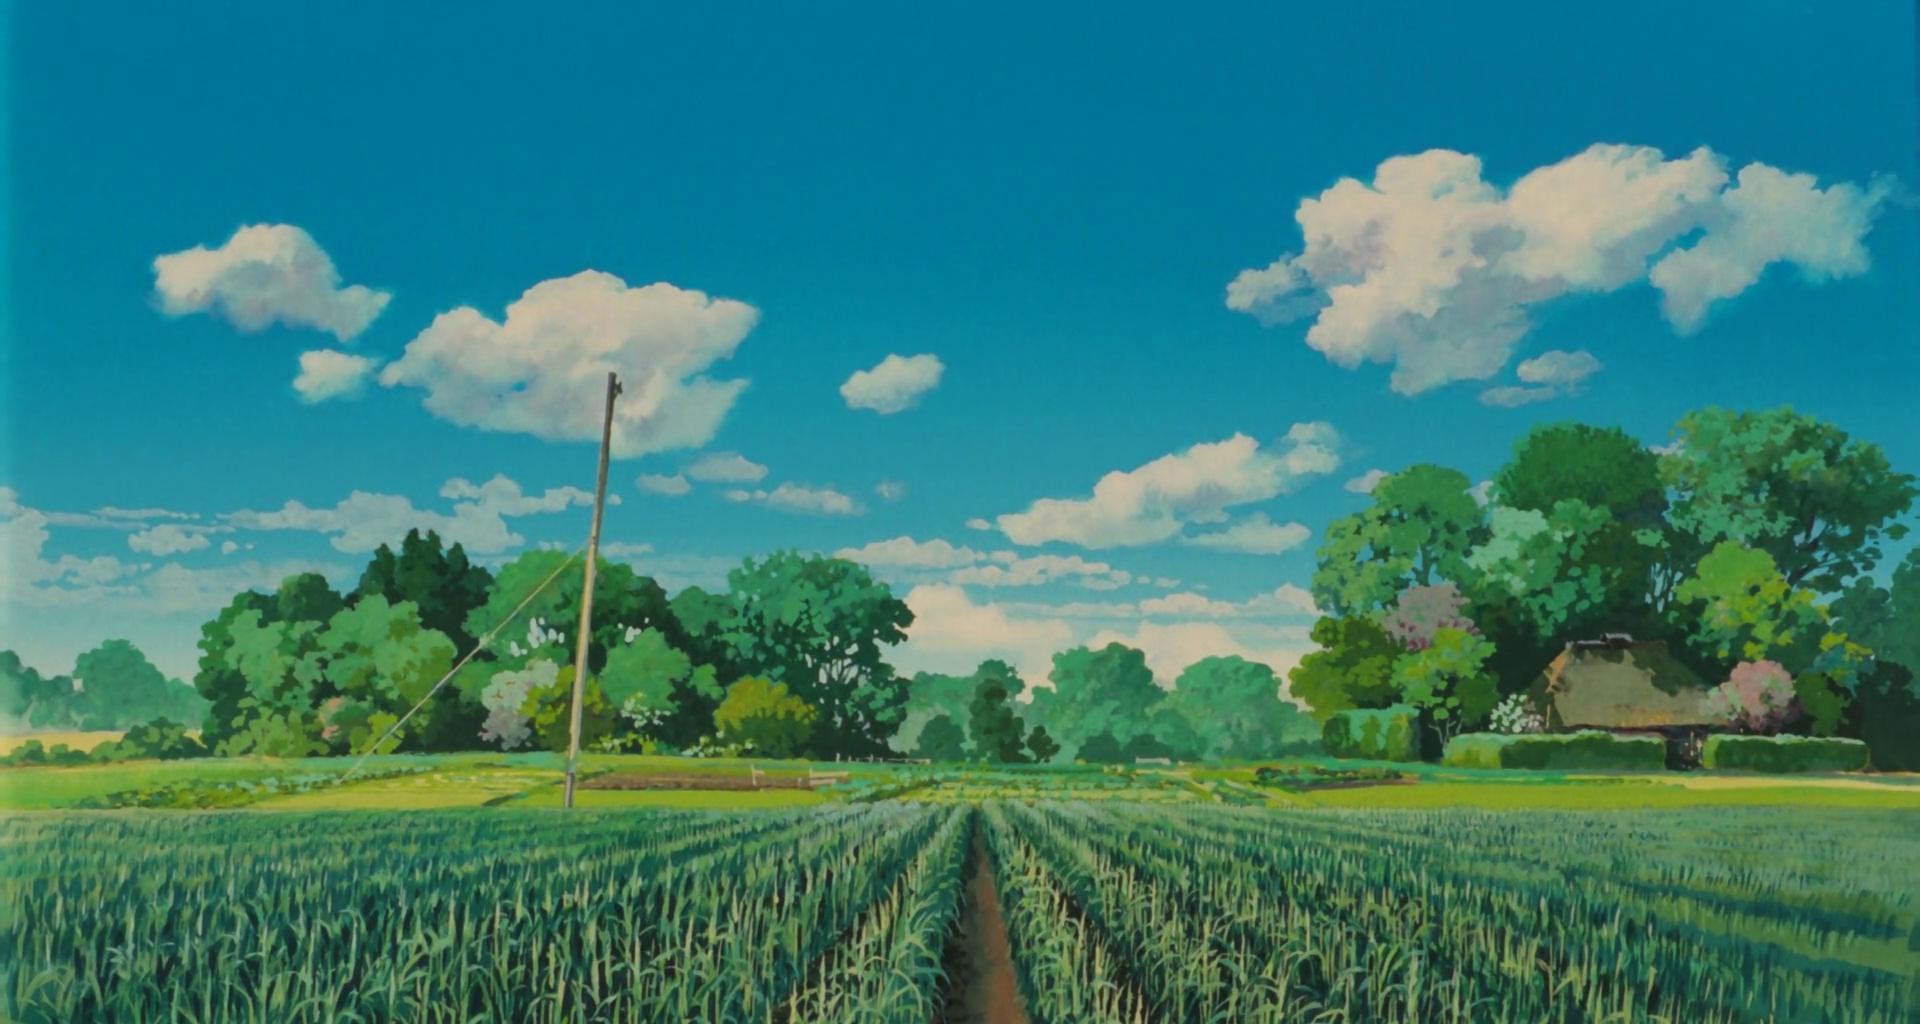 Studio Ghibli Scenery Wallpapers Top Free Studio Ghibli Scenery Backgrounds Wallpaperaccess